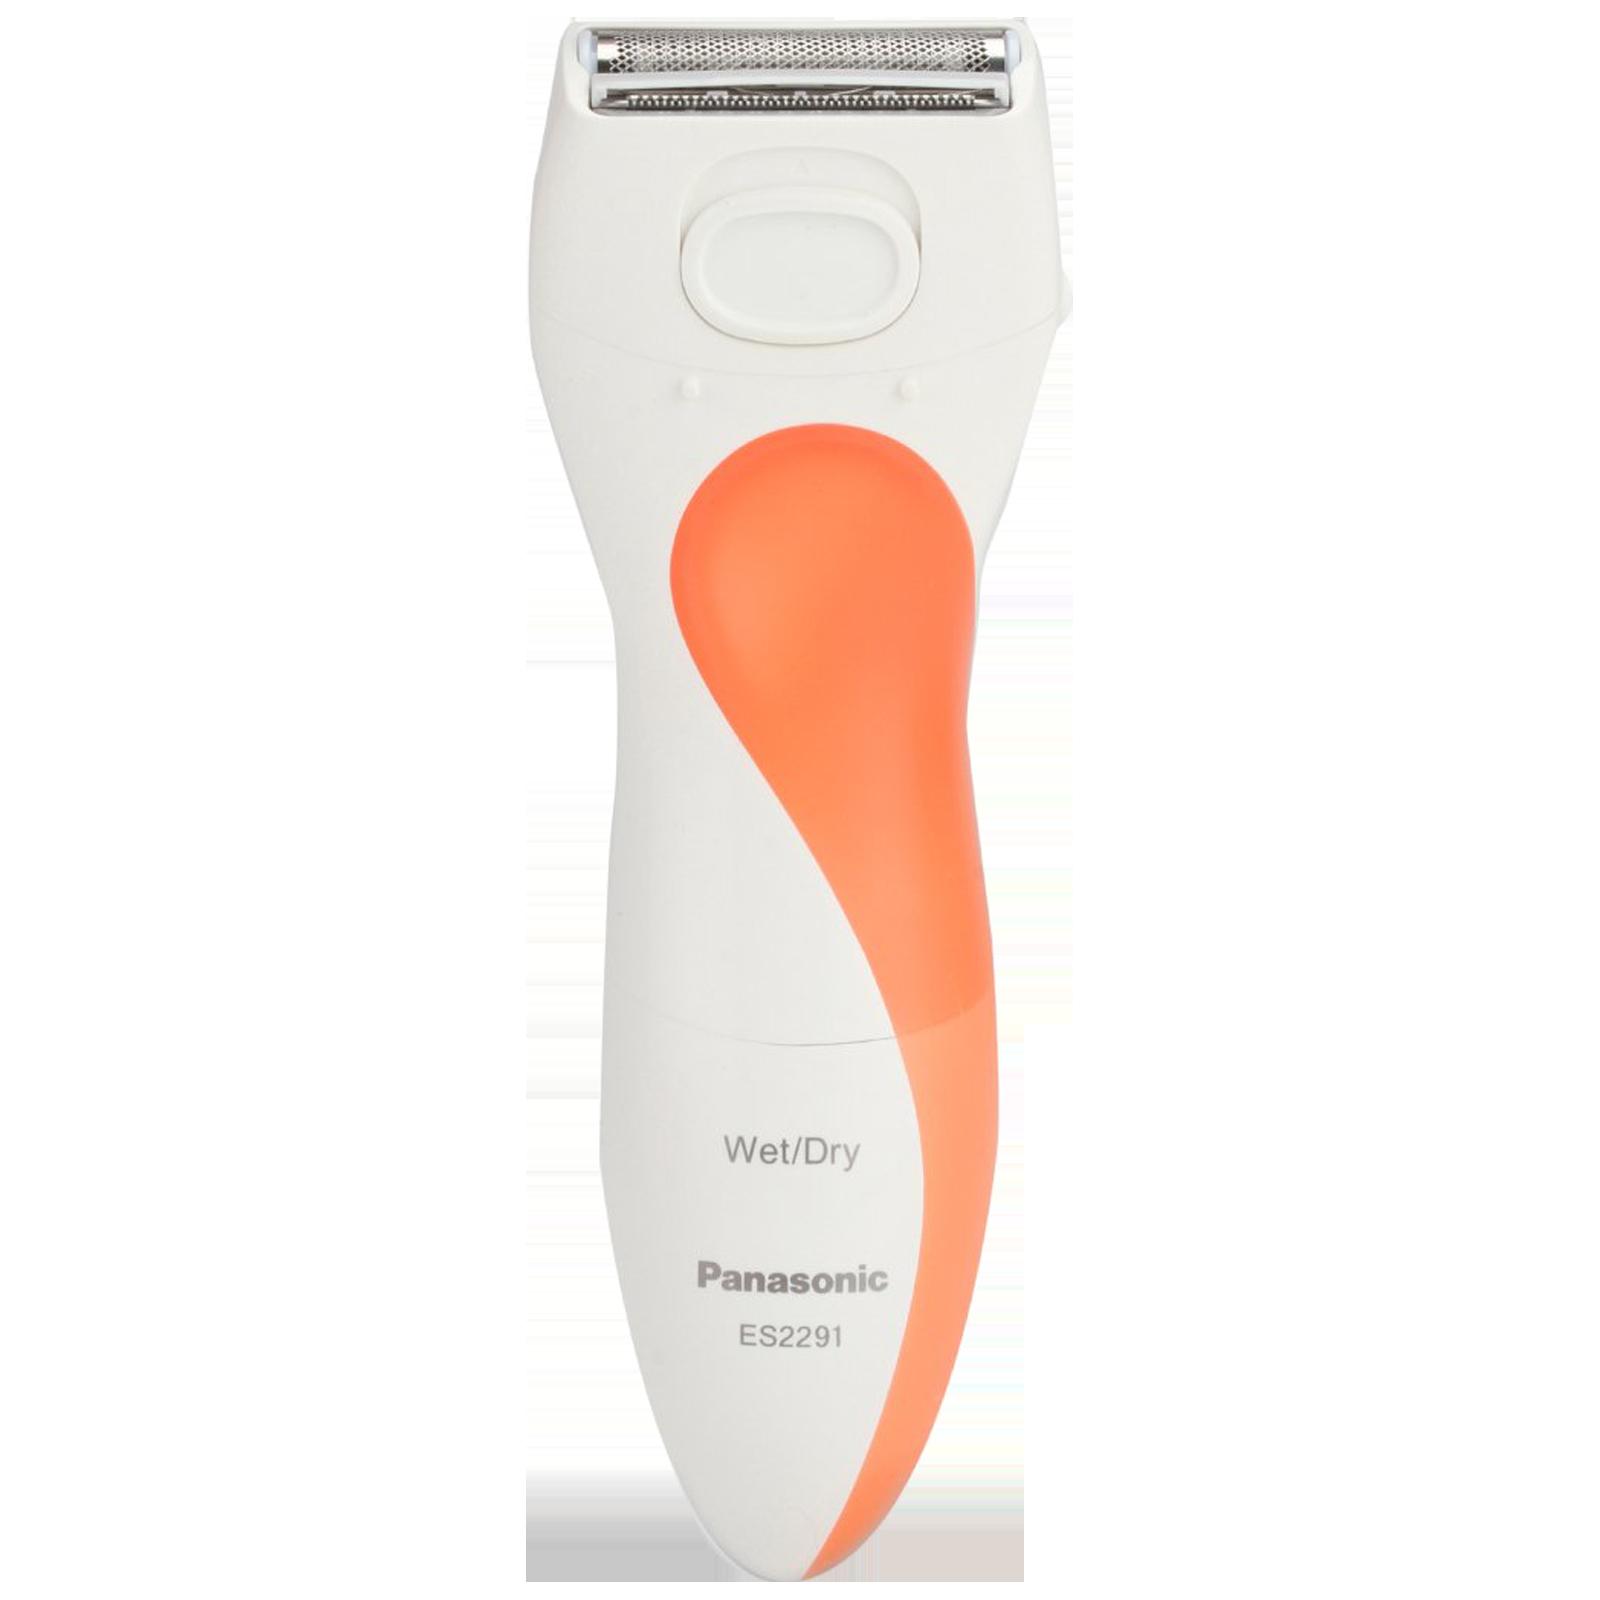 Panasonic Stainless Steel Blades Cordless Wet & Dry Shaver (Washable Heads, ES2291D503, Orange/White)_1